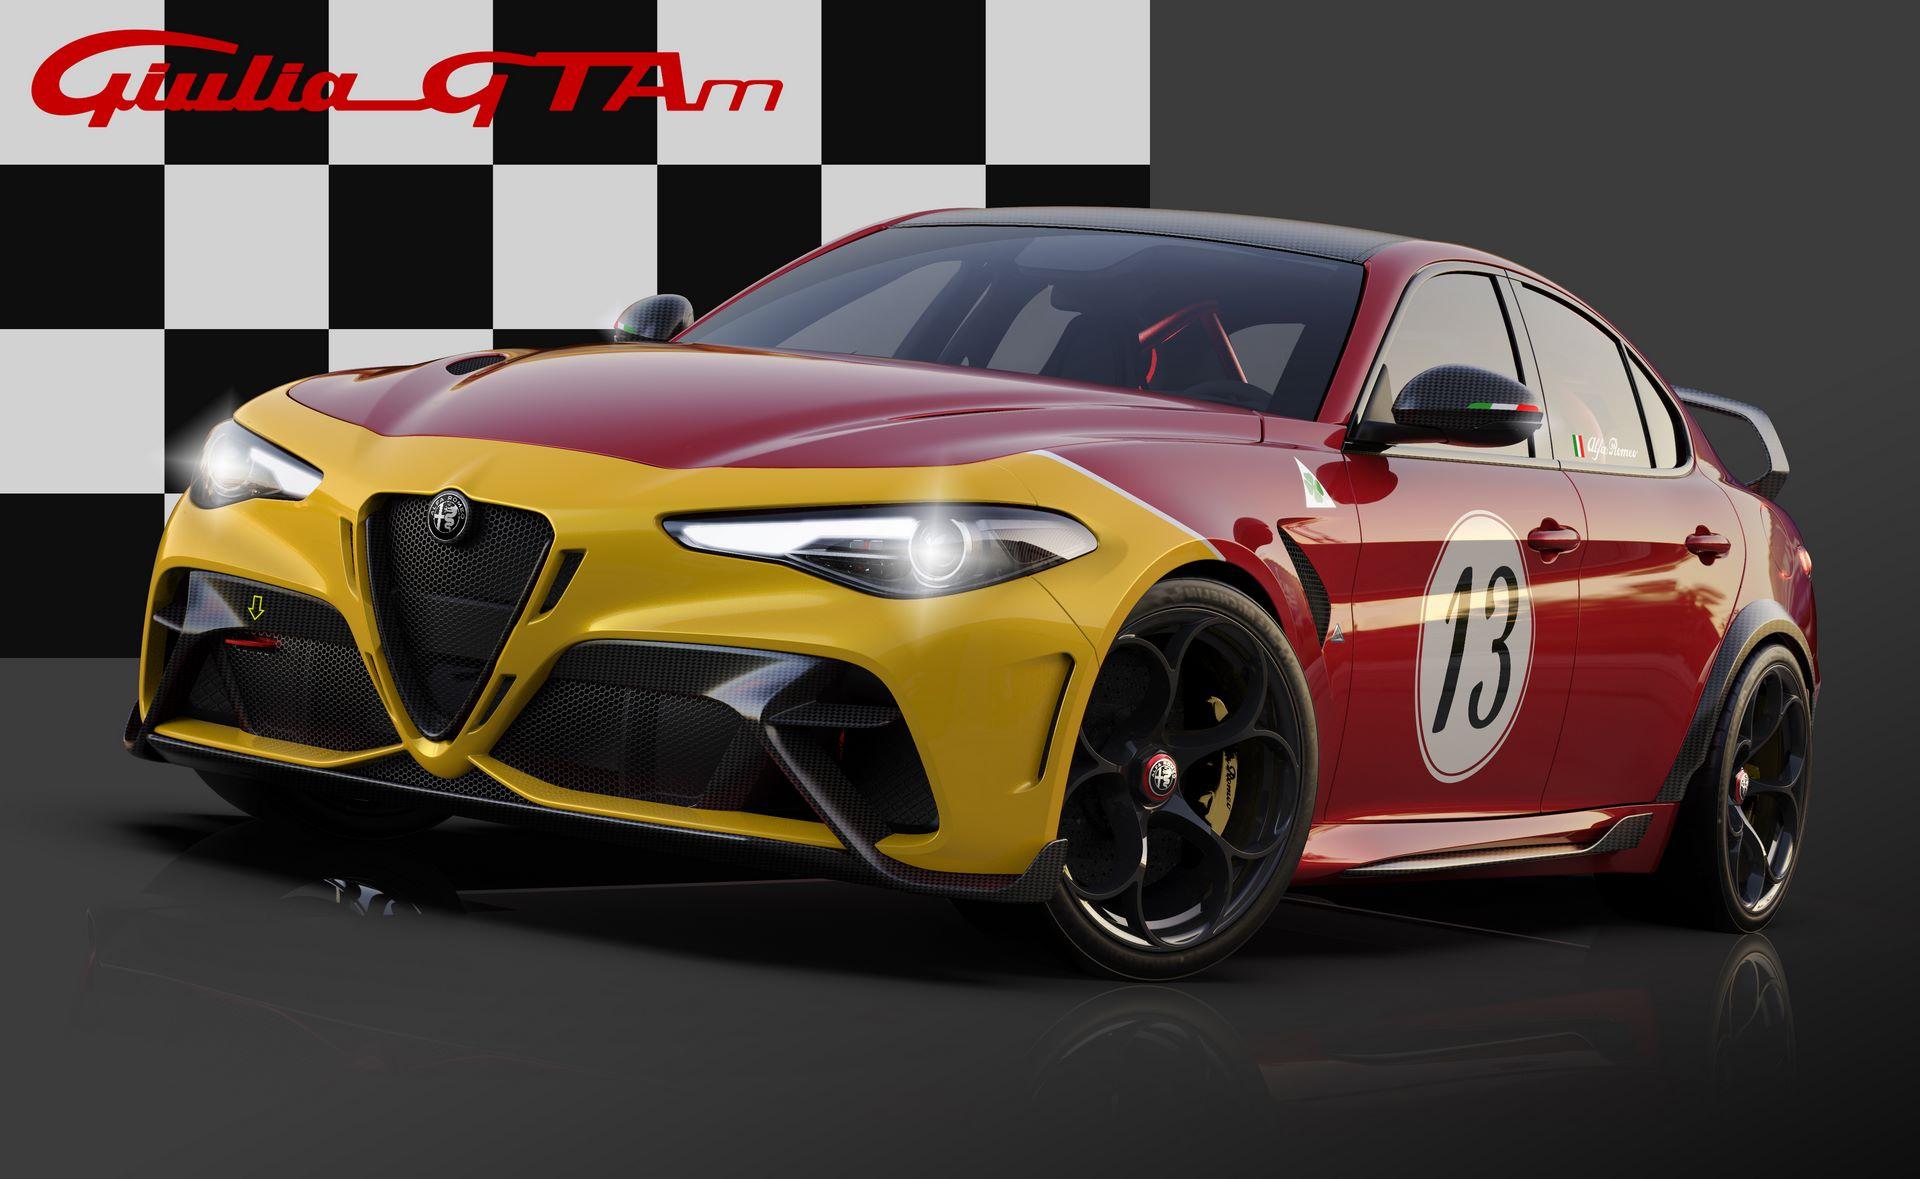 22_Alfa-Romeo-Giulia-GTA-dedicated-Livery